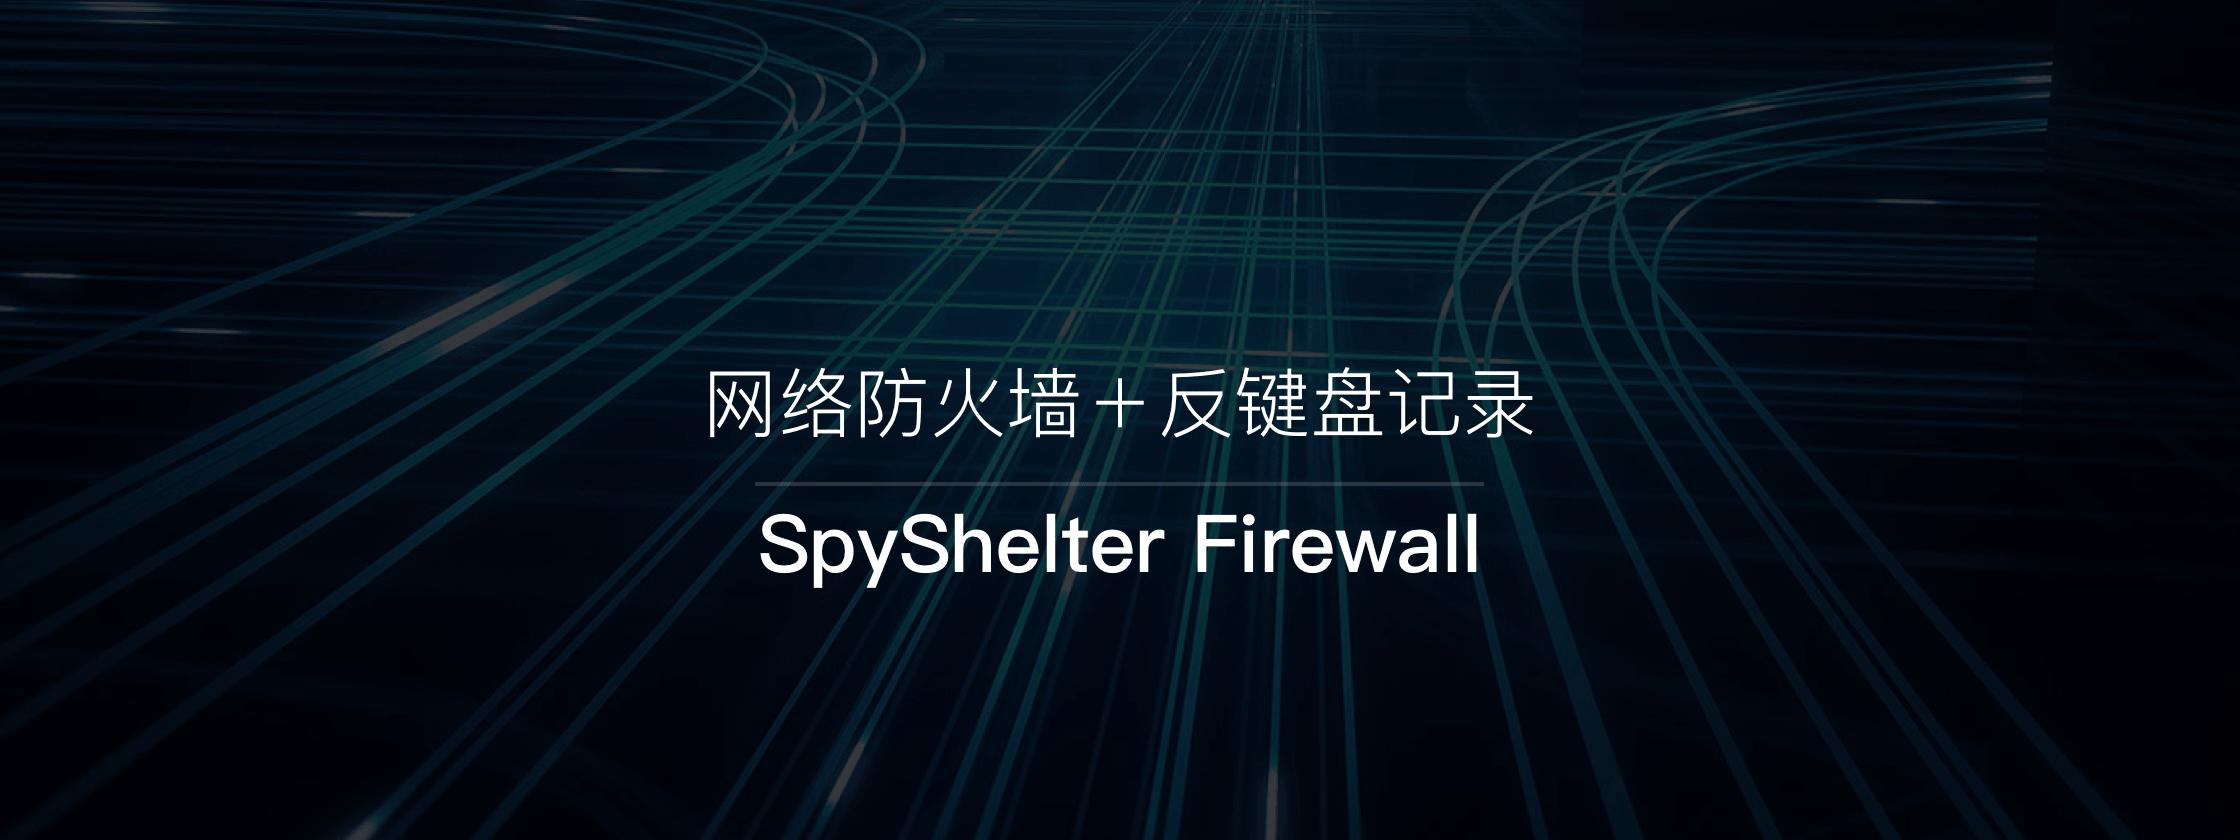 SpyShelter Firewall – 网络防火墙+反键盘记录